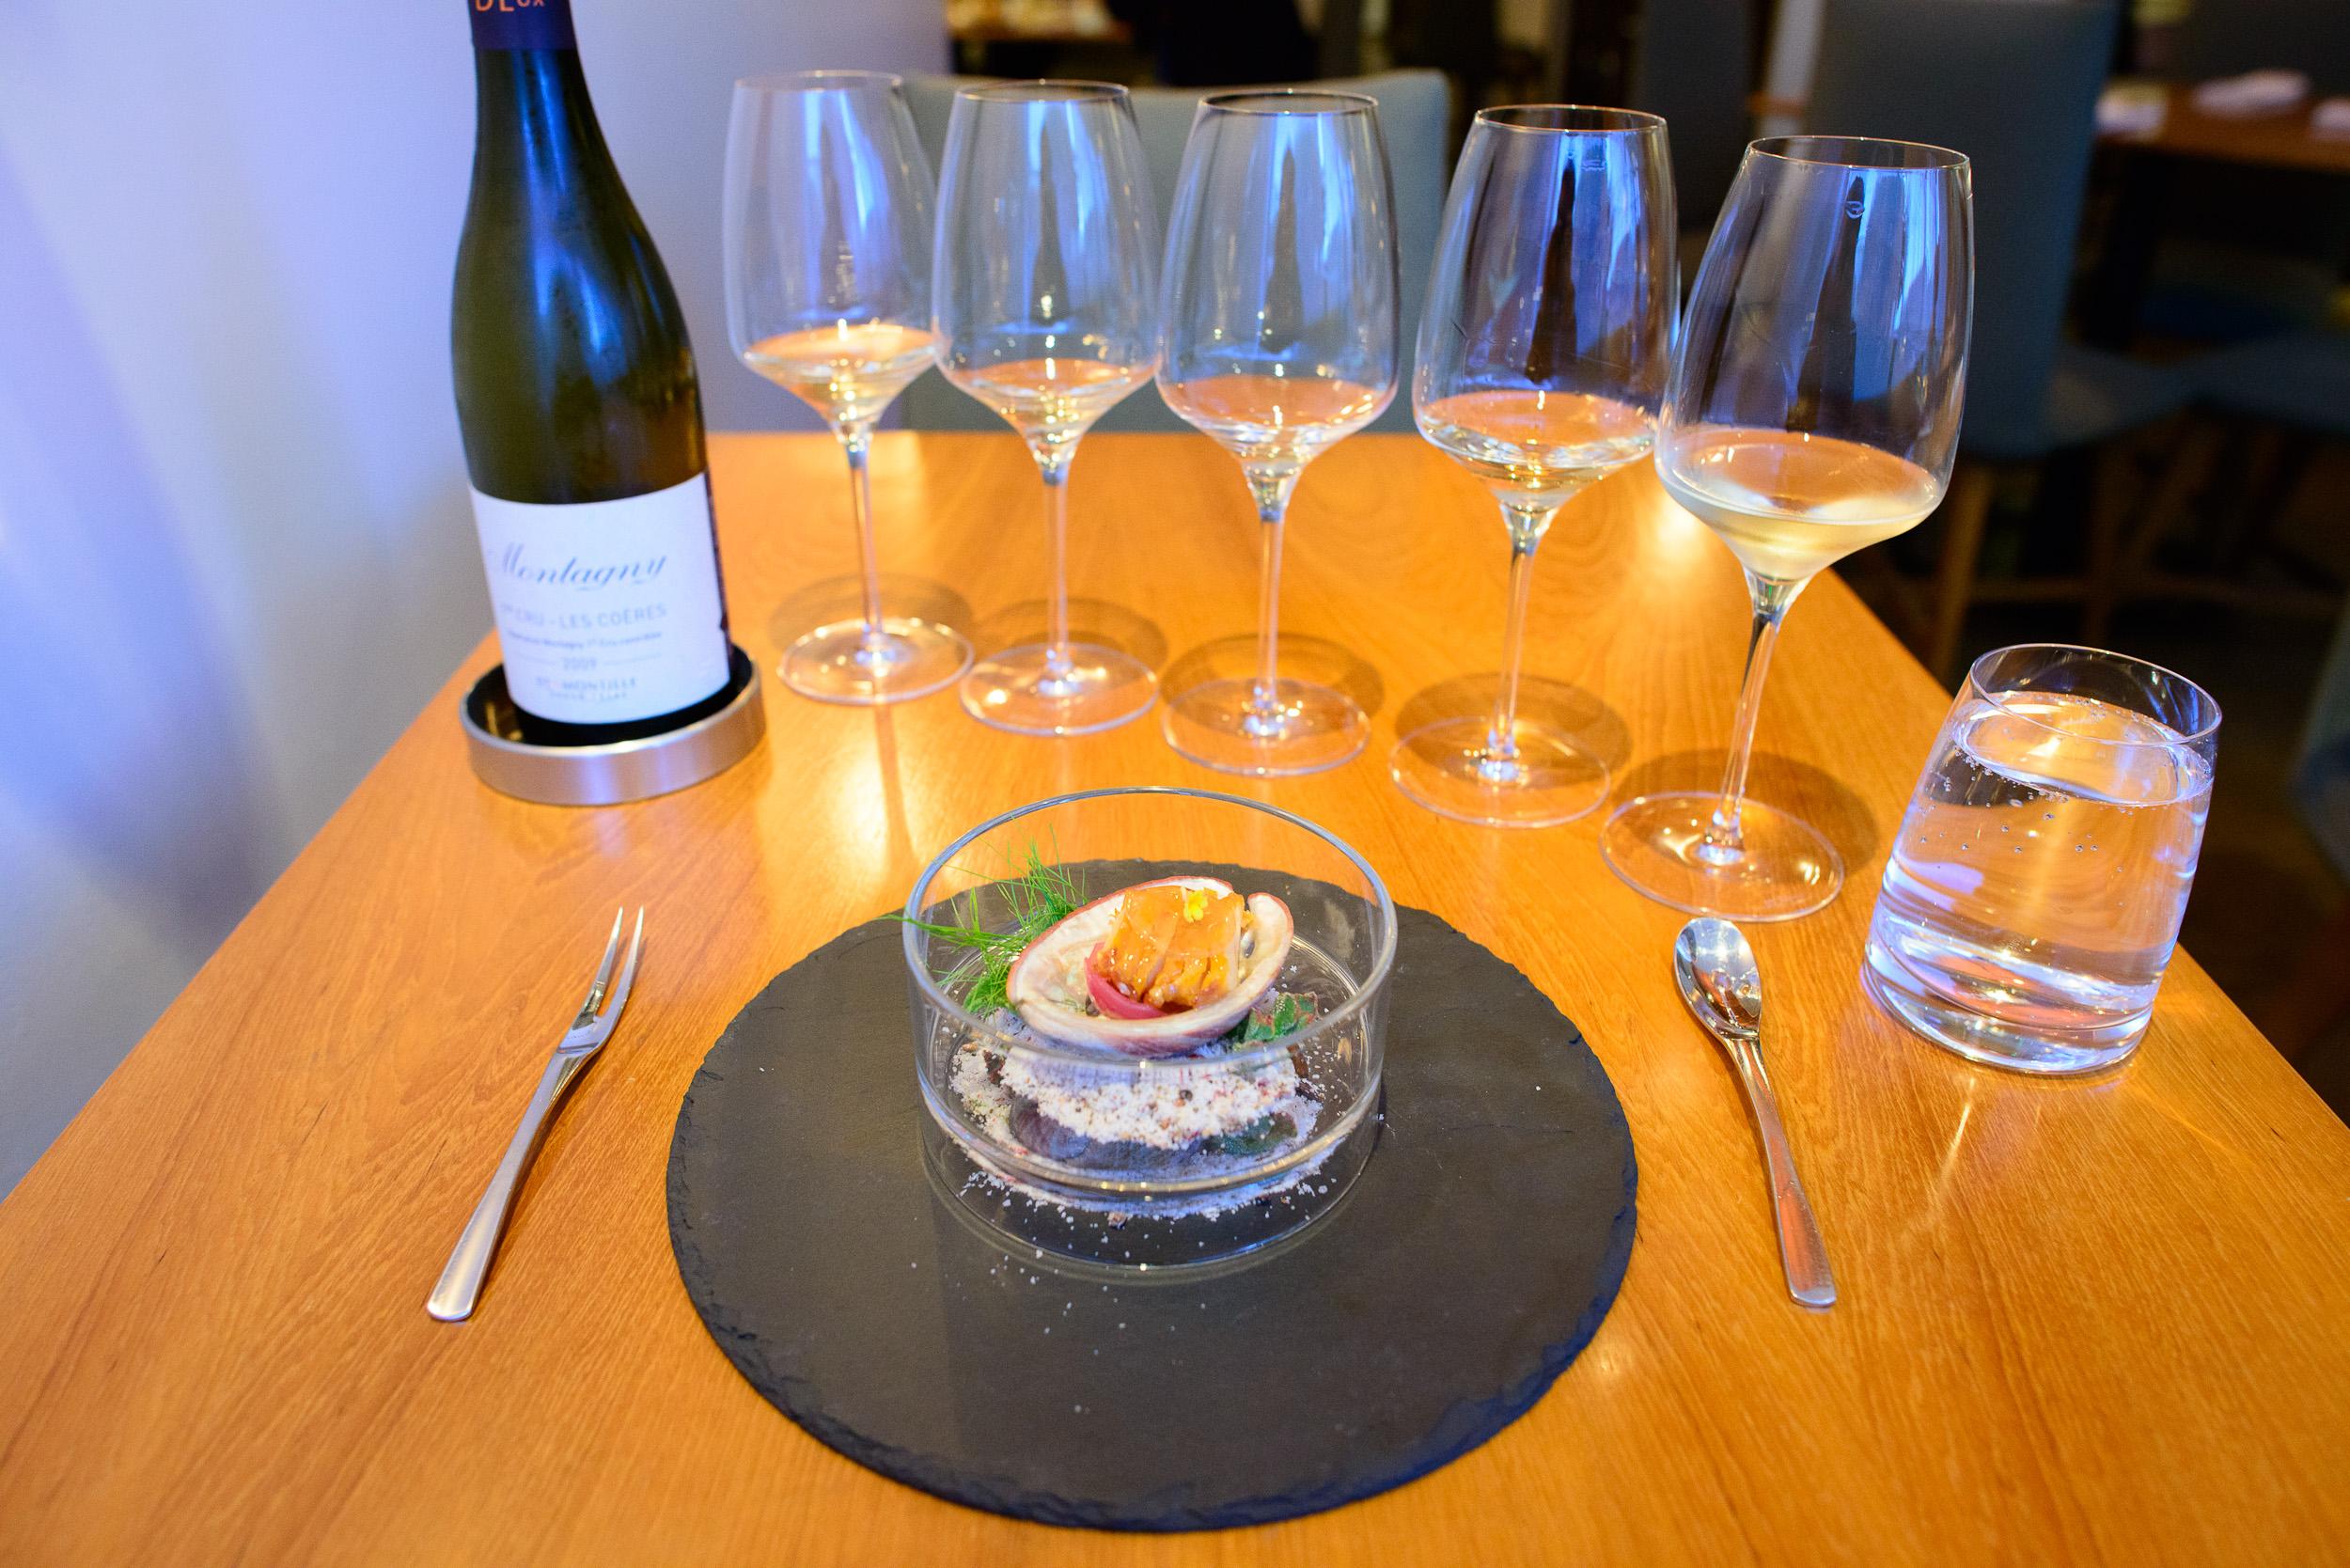 7th Course: Abalone, Allium, Dashi